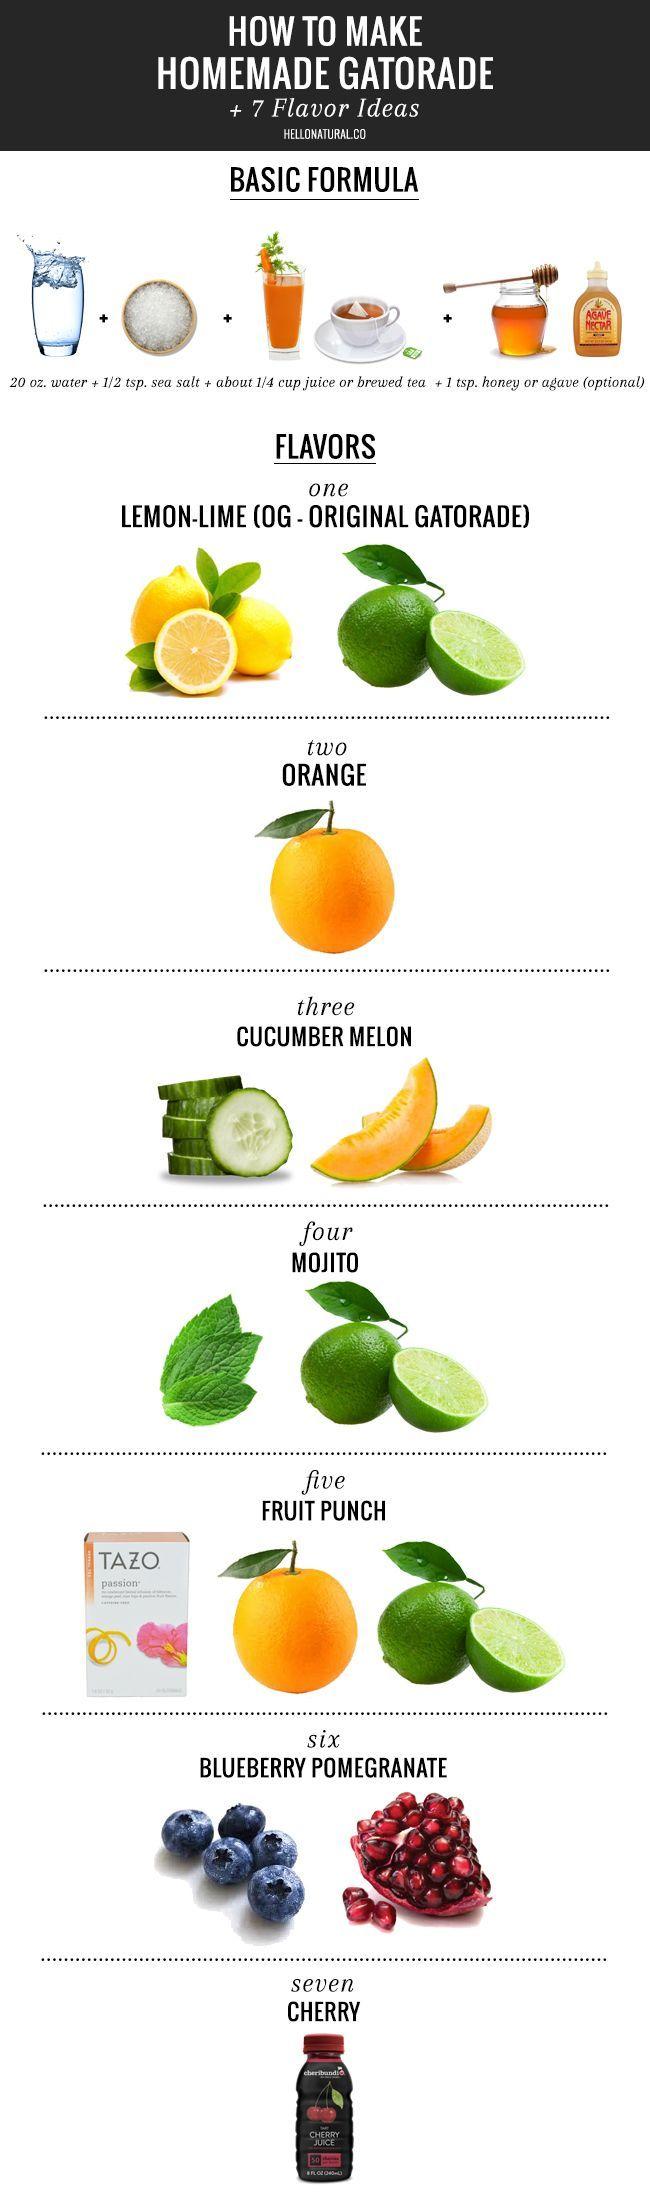 Make Your Own Homemade Gatorade   7 Flavor Ideas | http://hellonatural.co/how-to-make-homemade-gatorade-7-flavor-ideas/